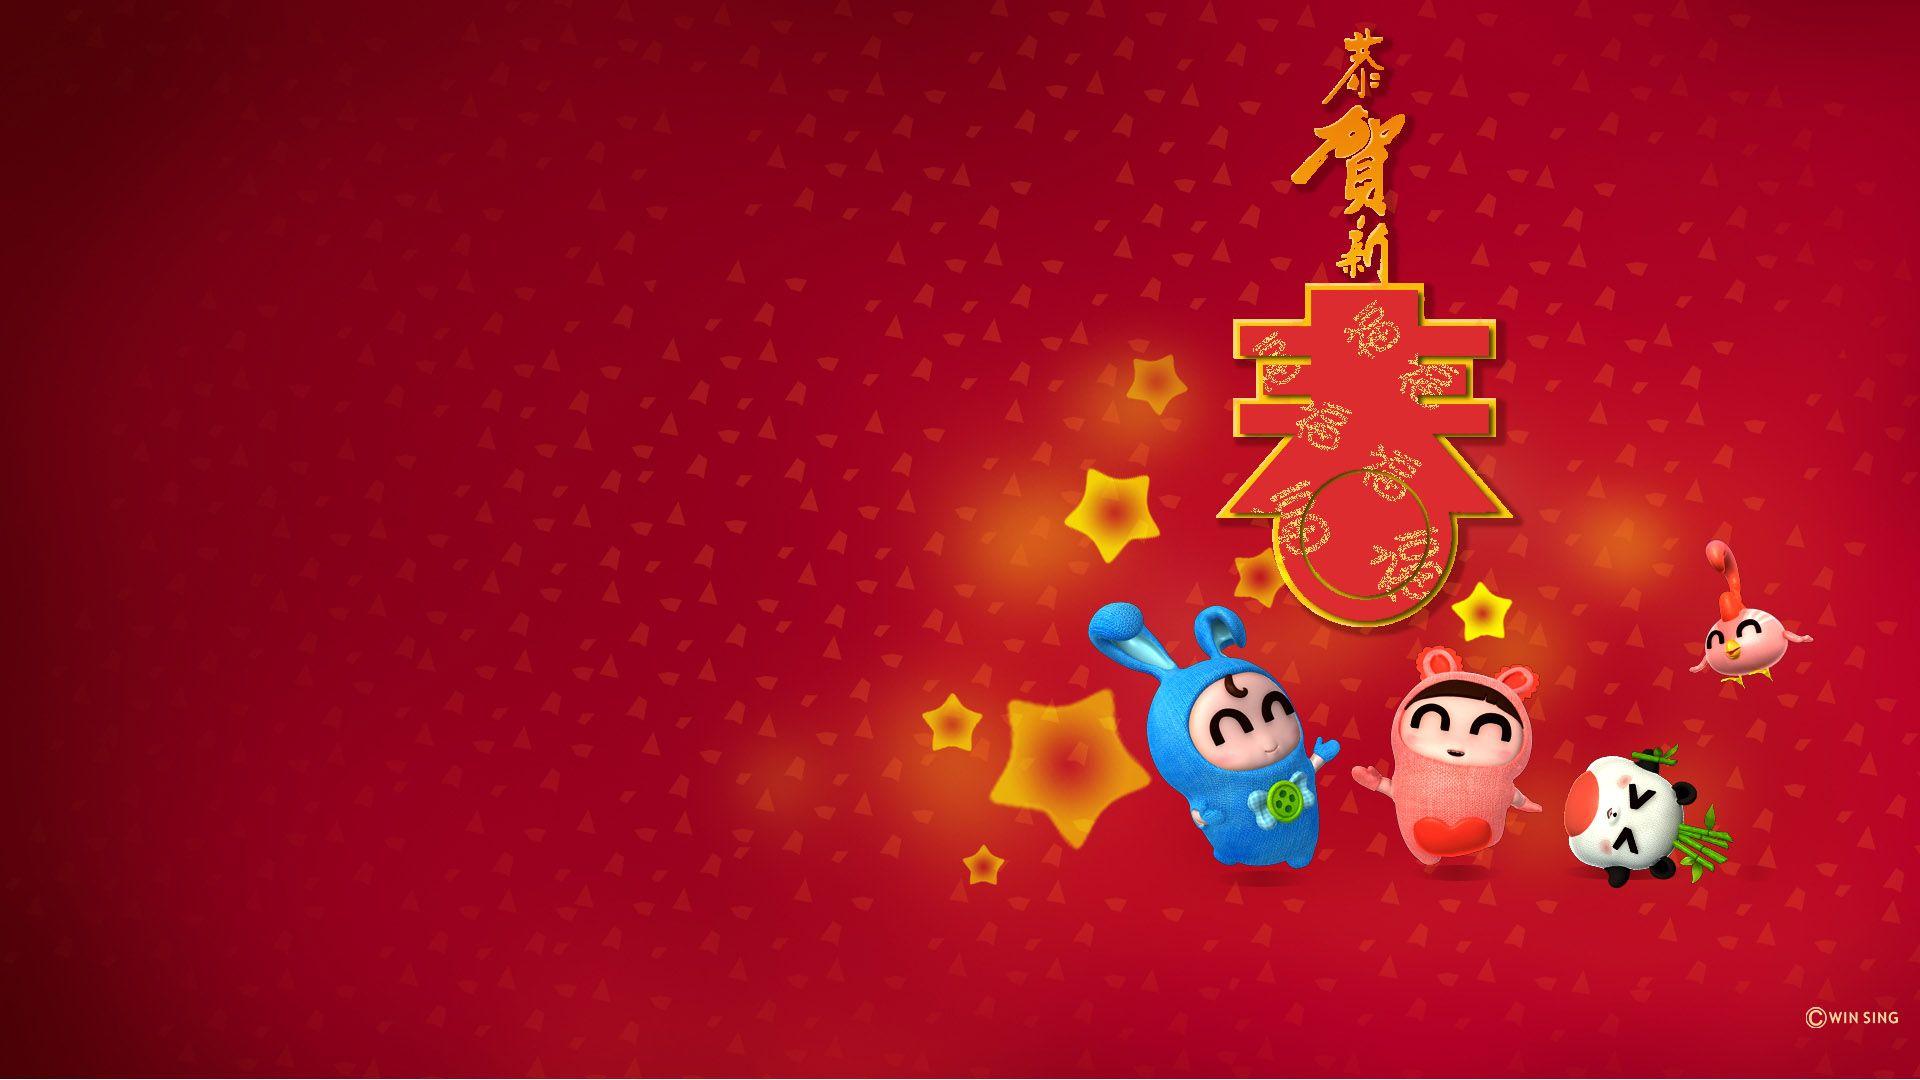 Chinese New Year Wallpaper Desktop Wallpapers 1920x1080